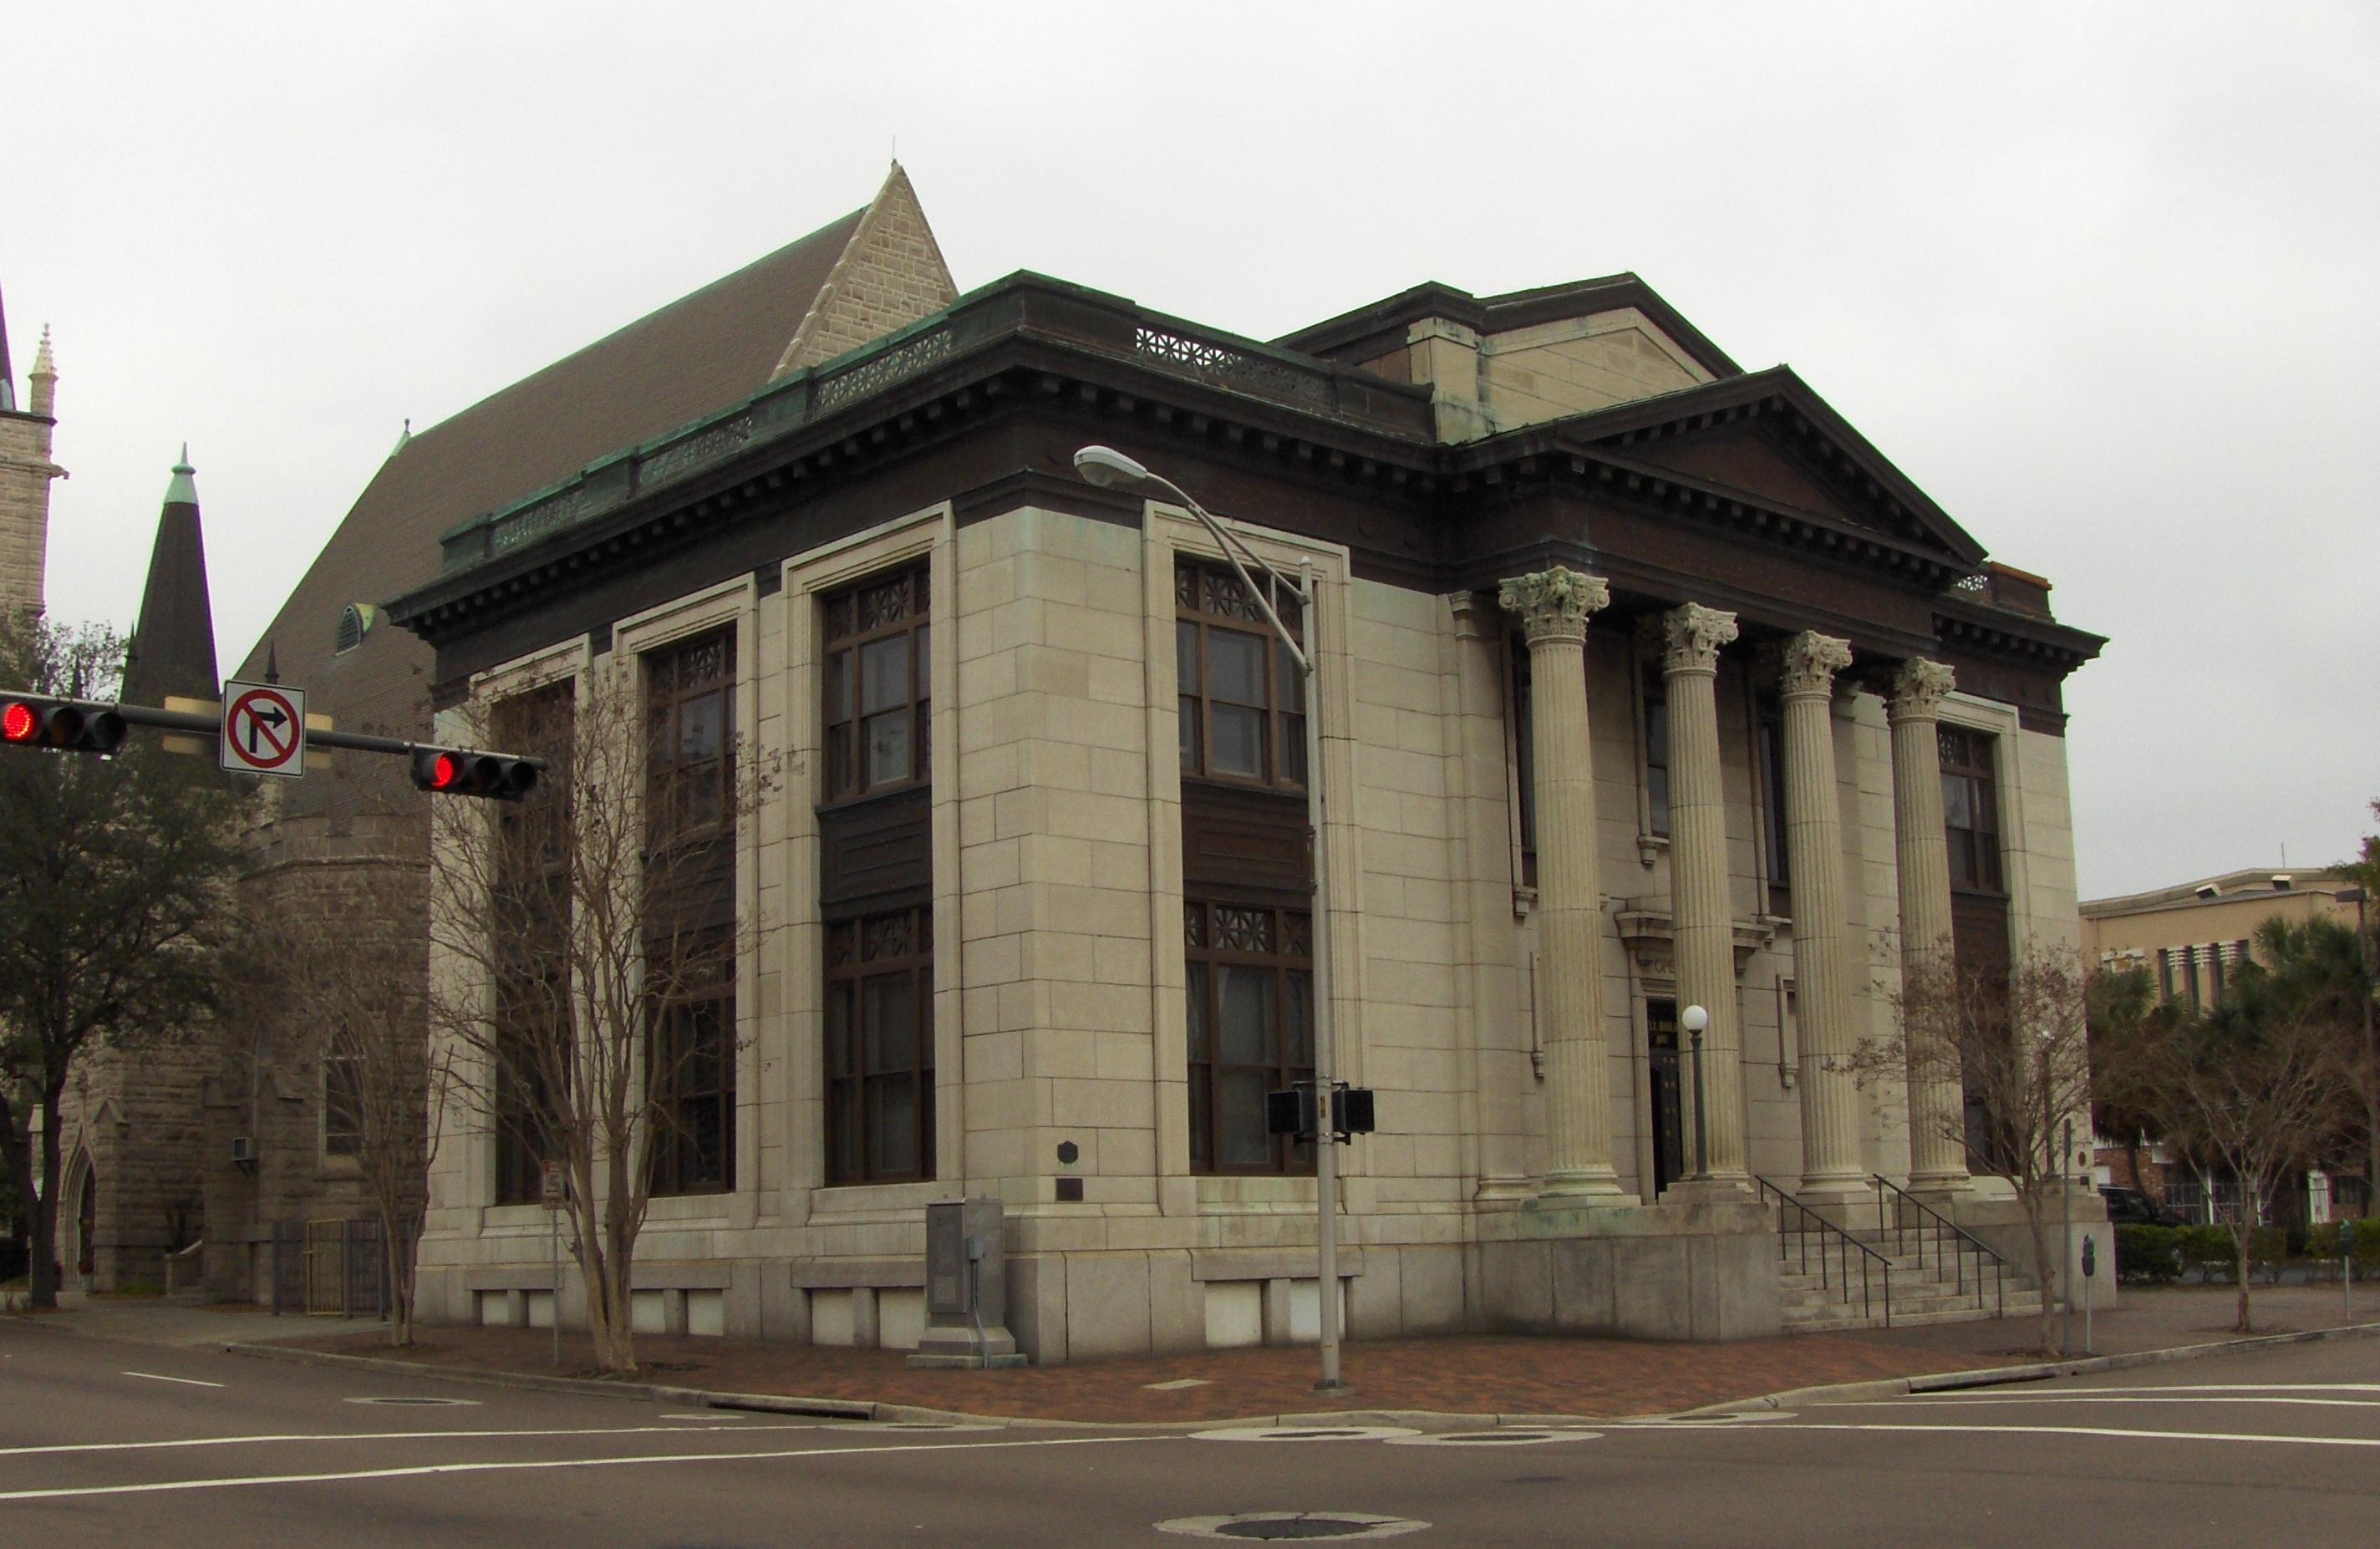 Old Jacksonville Free Public Library, Jacksonville, FL